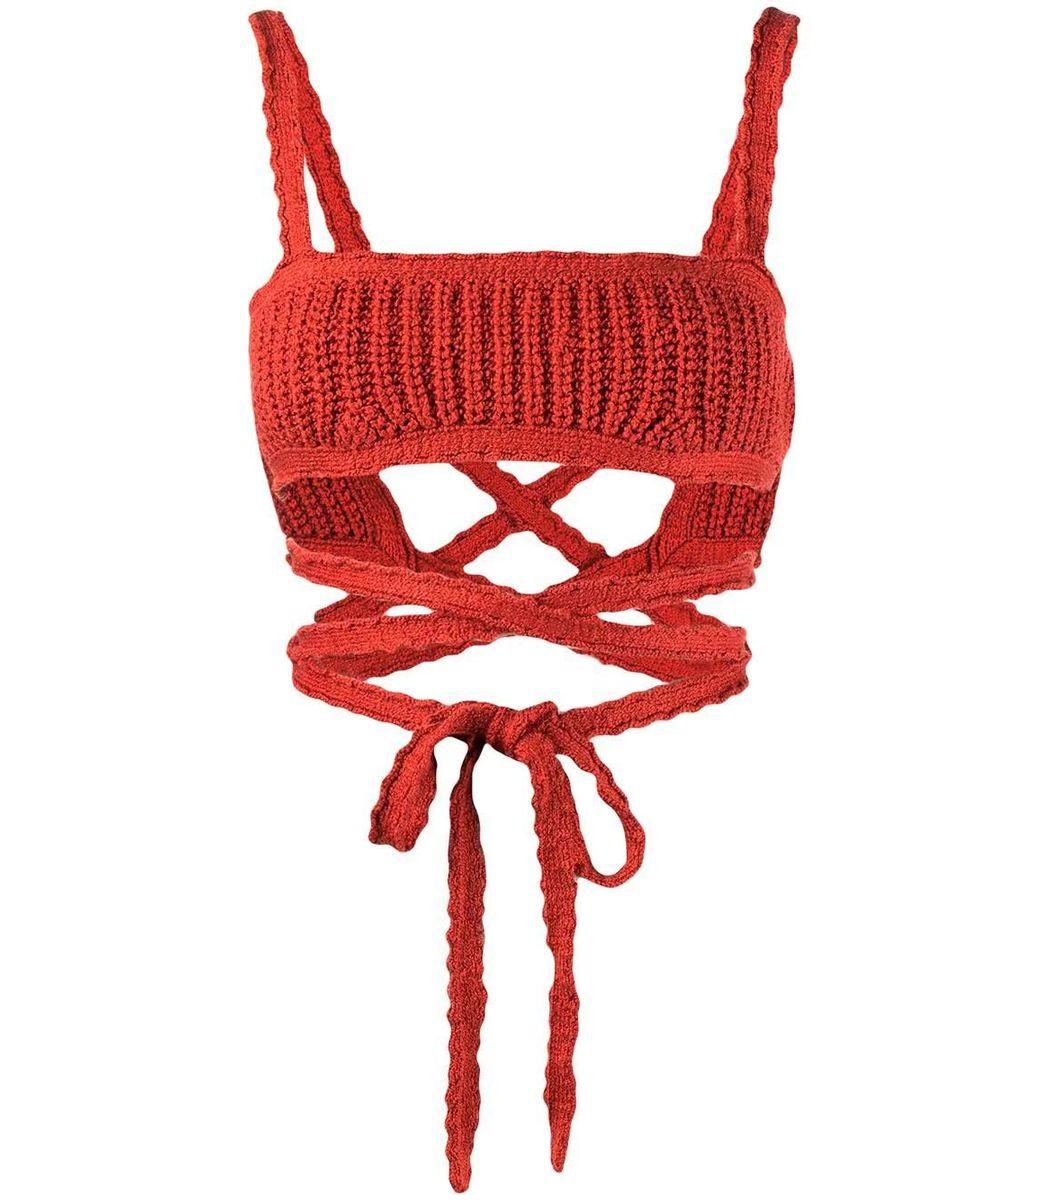 Alanui Bras Cacti Crochet Wrap Bra Top, Red Dulse